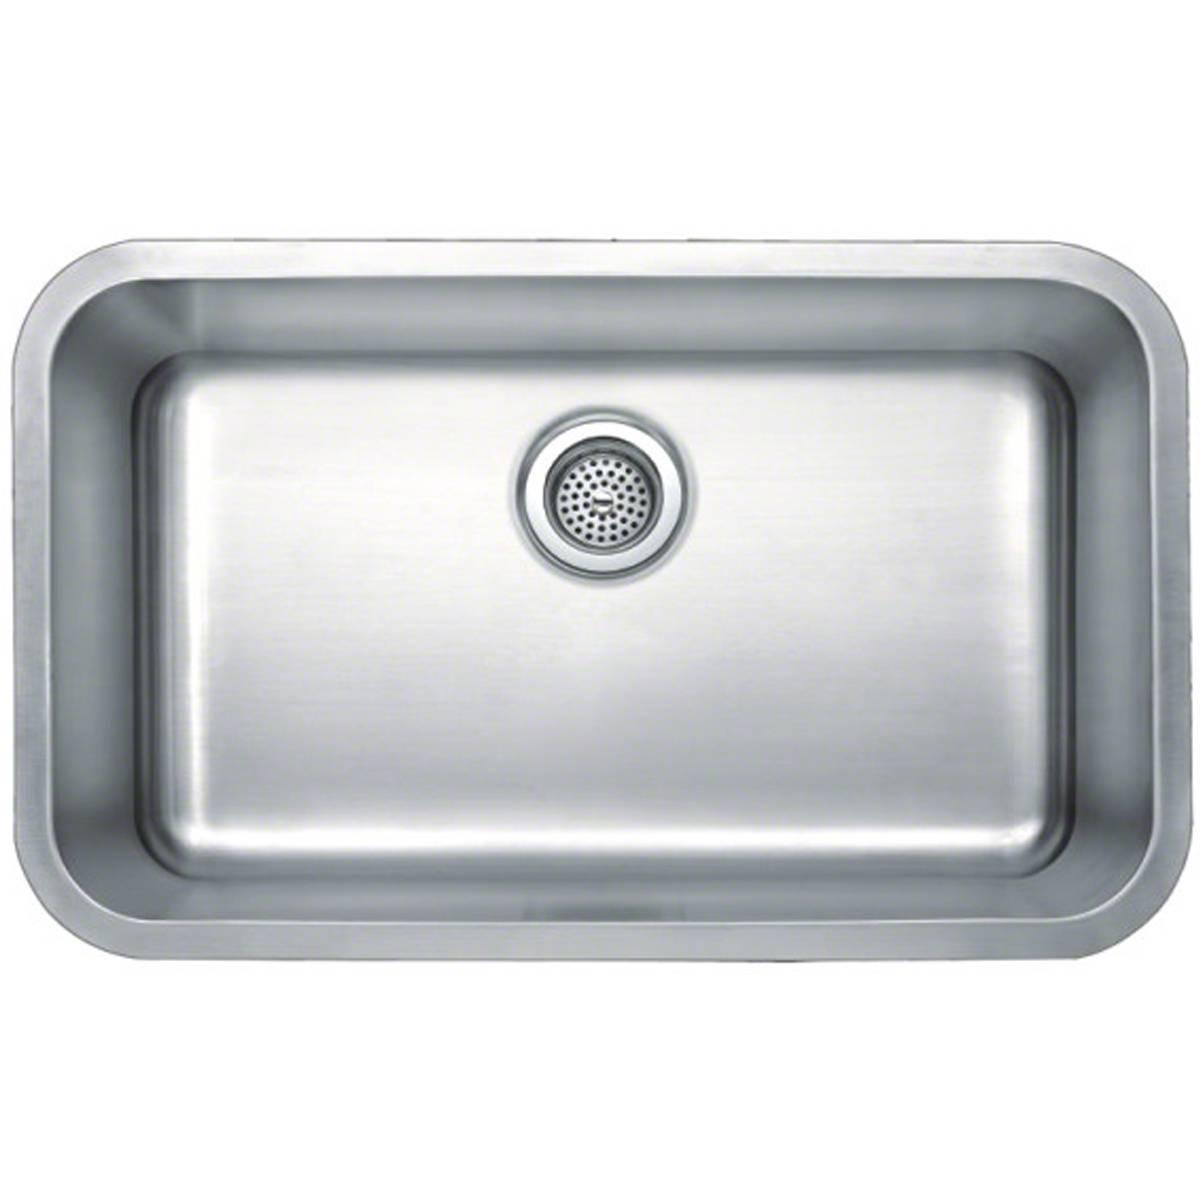 Sinks -ss-18-gau-single-bowl-3018-SIN-18-SINBWL-3018